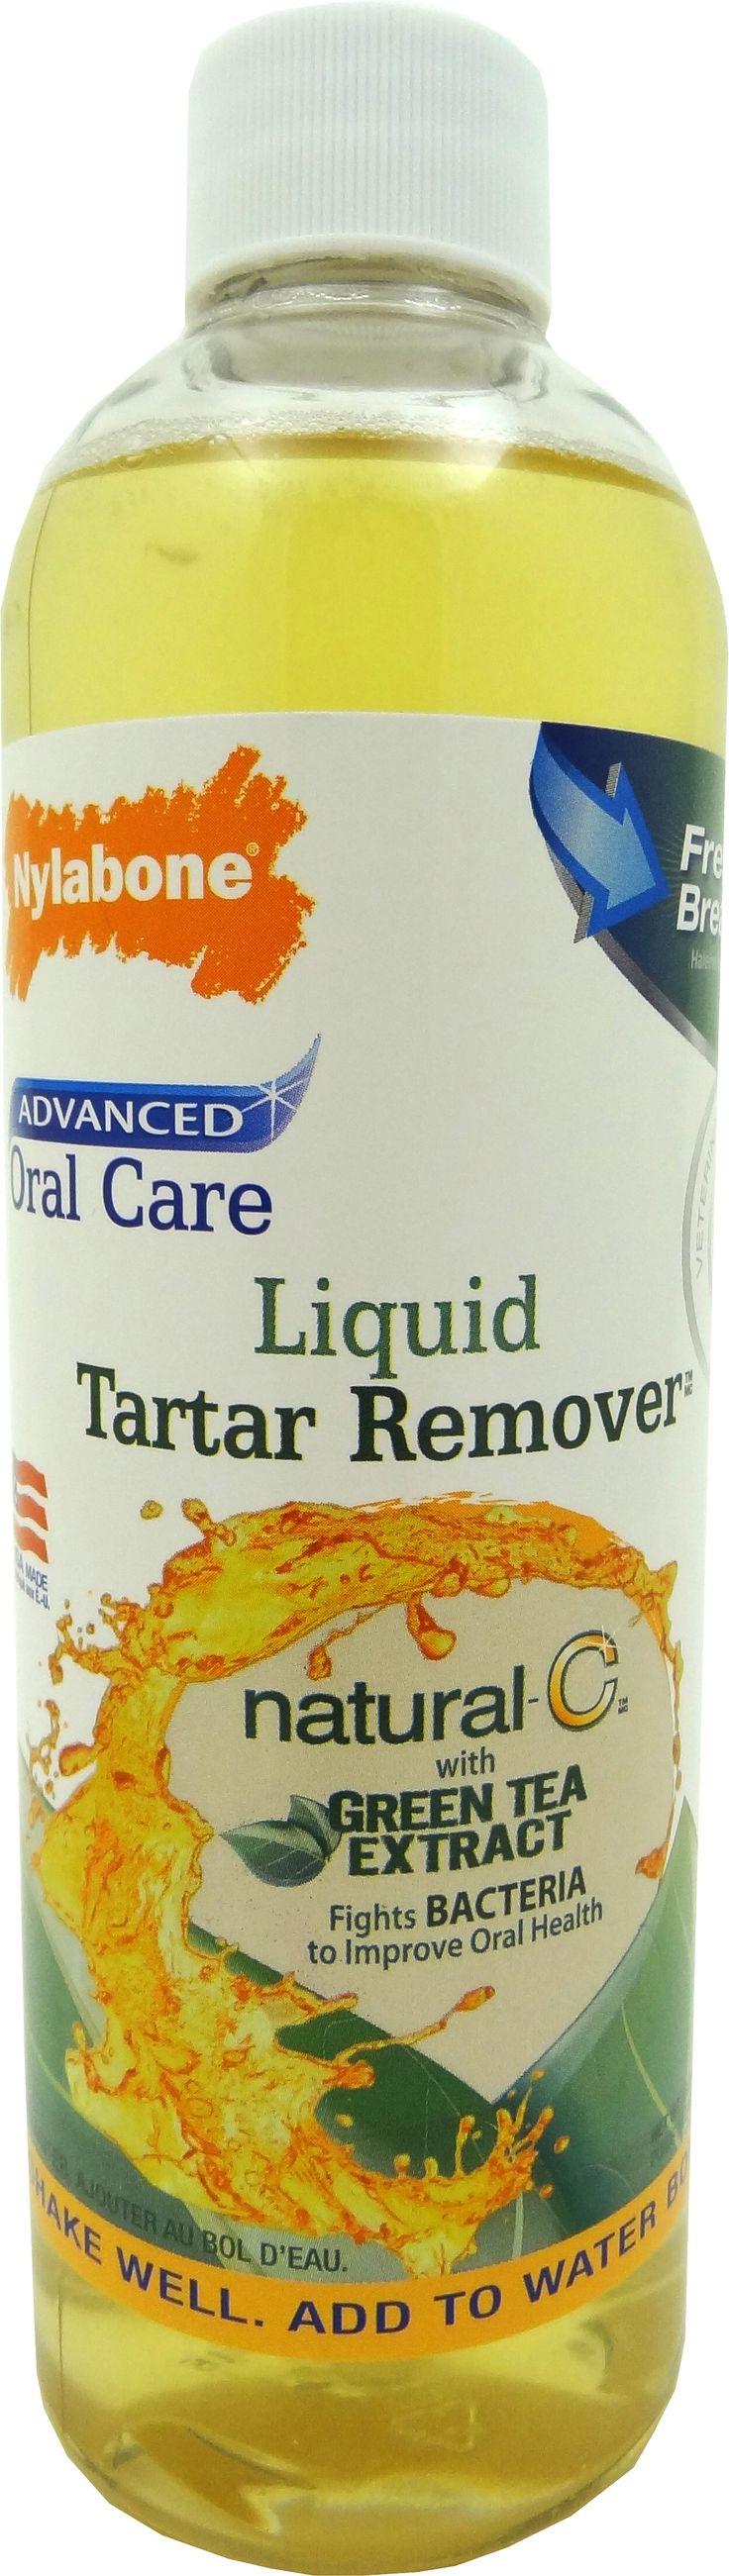 Nylabone Corp (bones)-Advanced Oral Care Natural Liquid Tartar Remover 16 Ounce